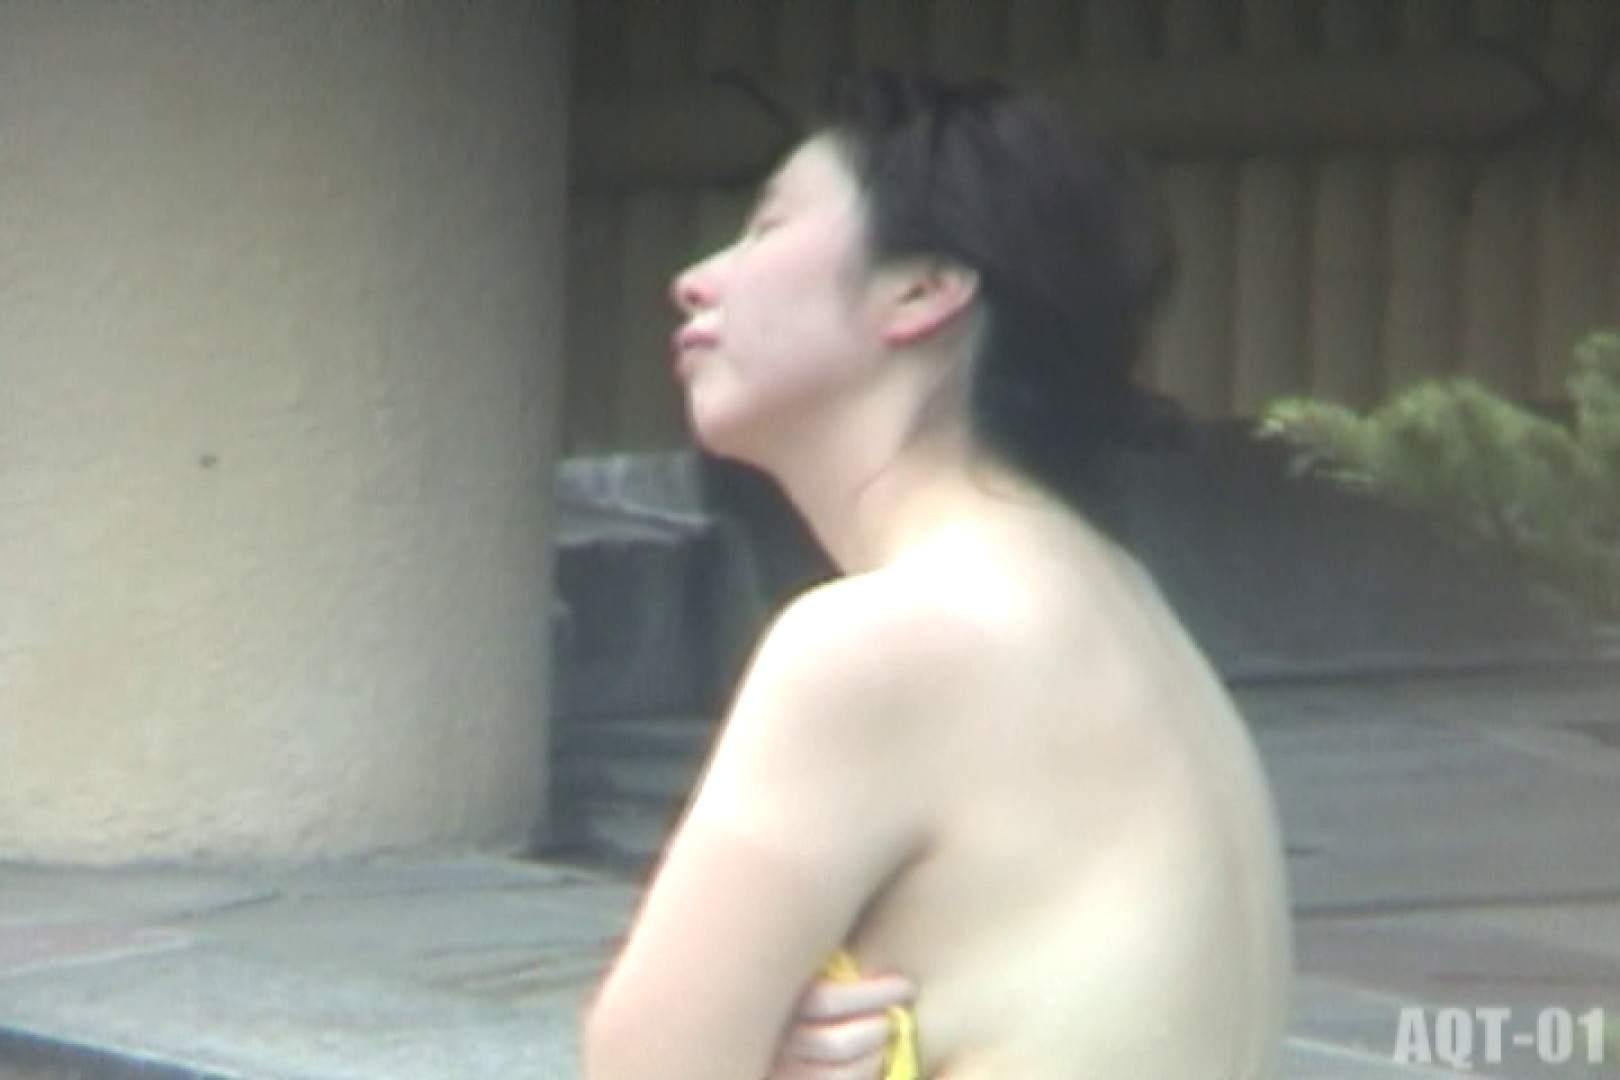 Aquaな露天風呂Vol.717 露天風呂編 | 盗撮シリーズ  111PIX 25